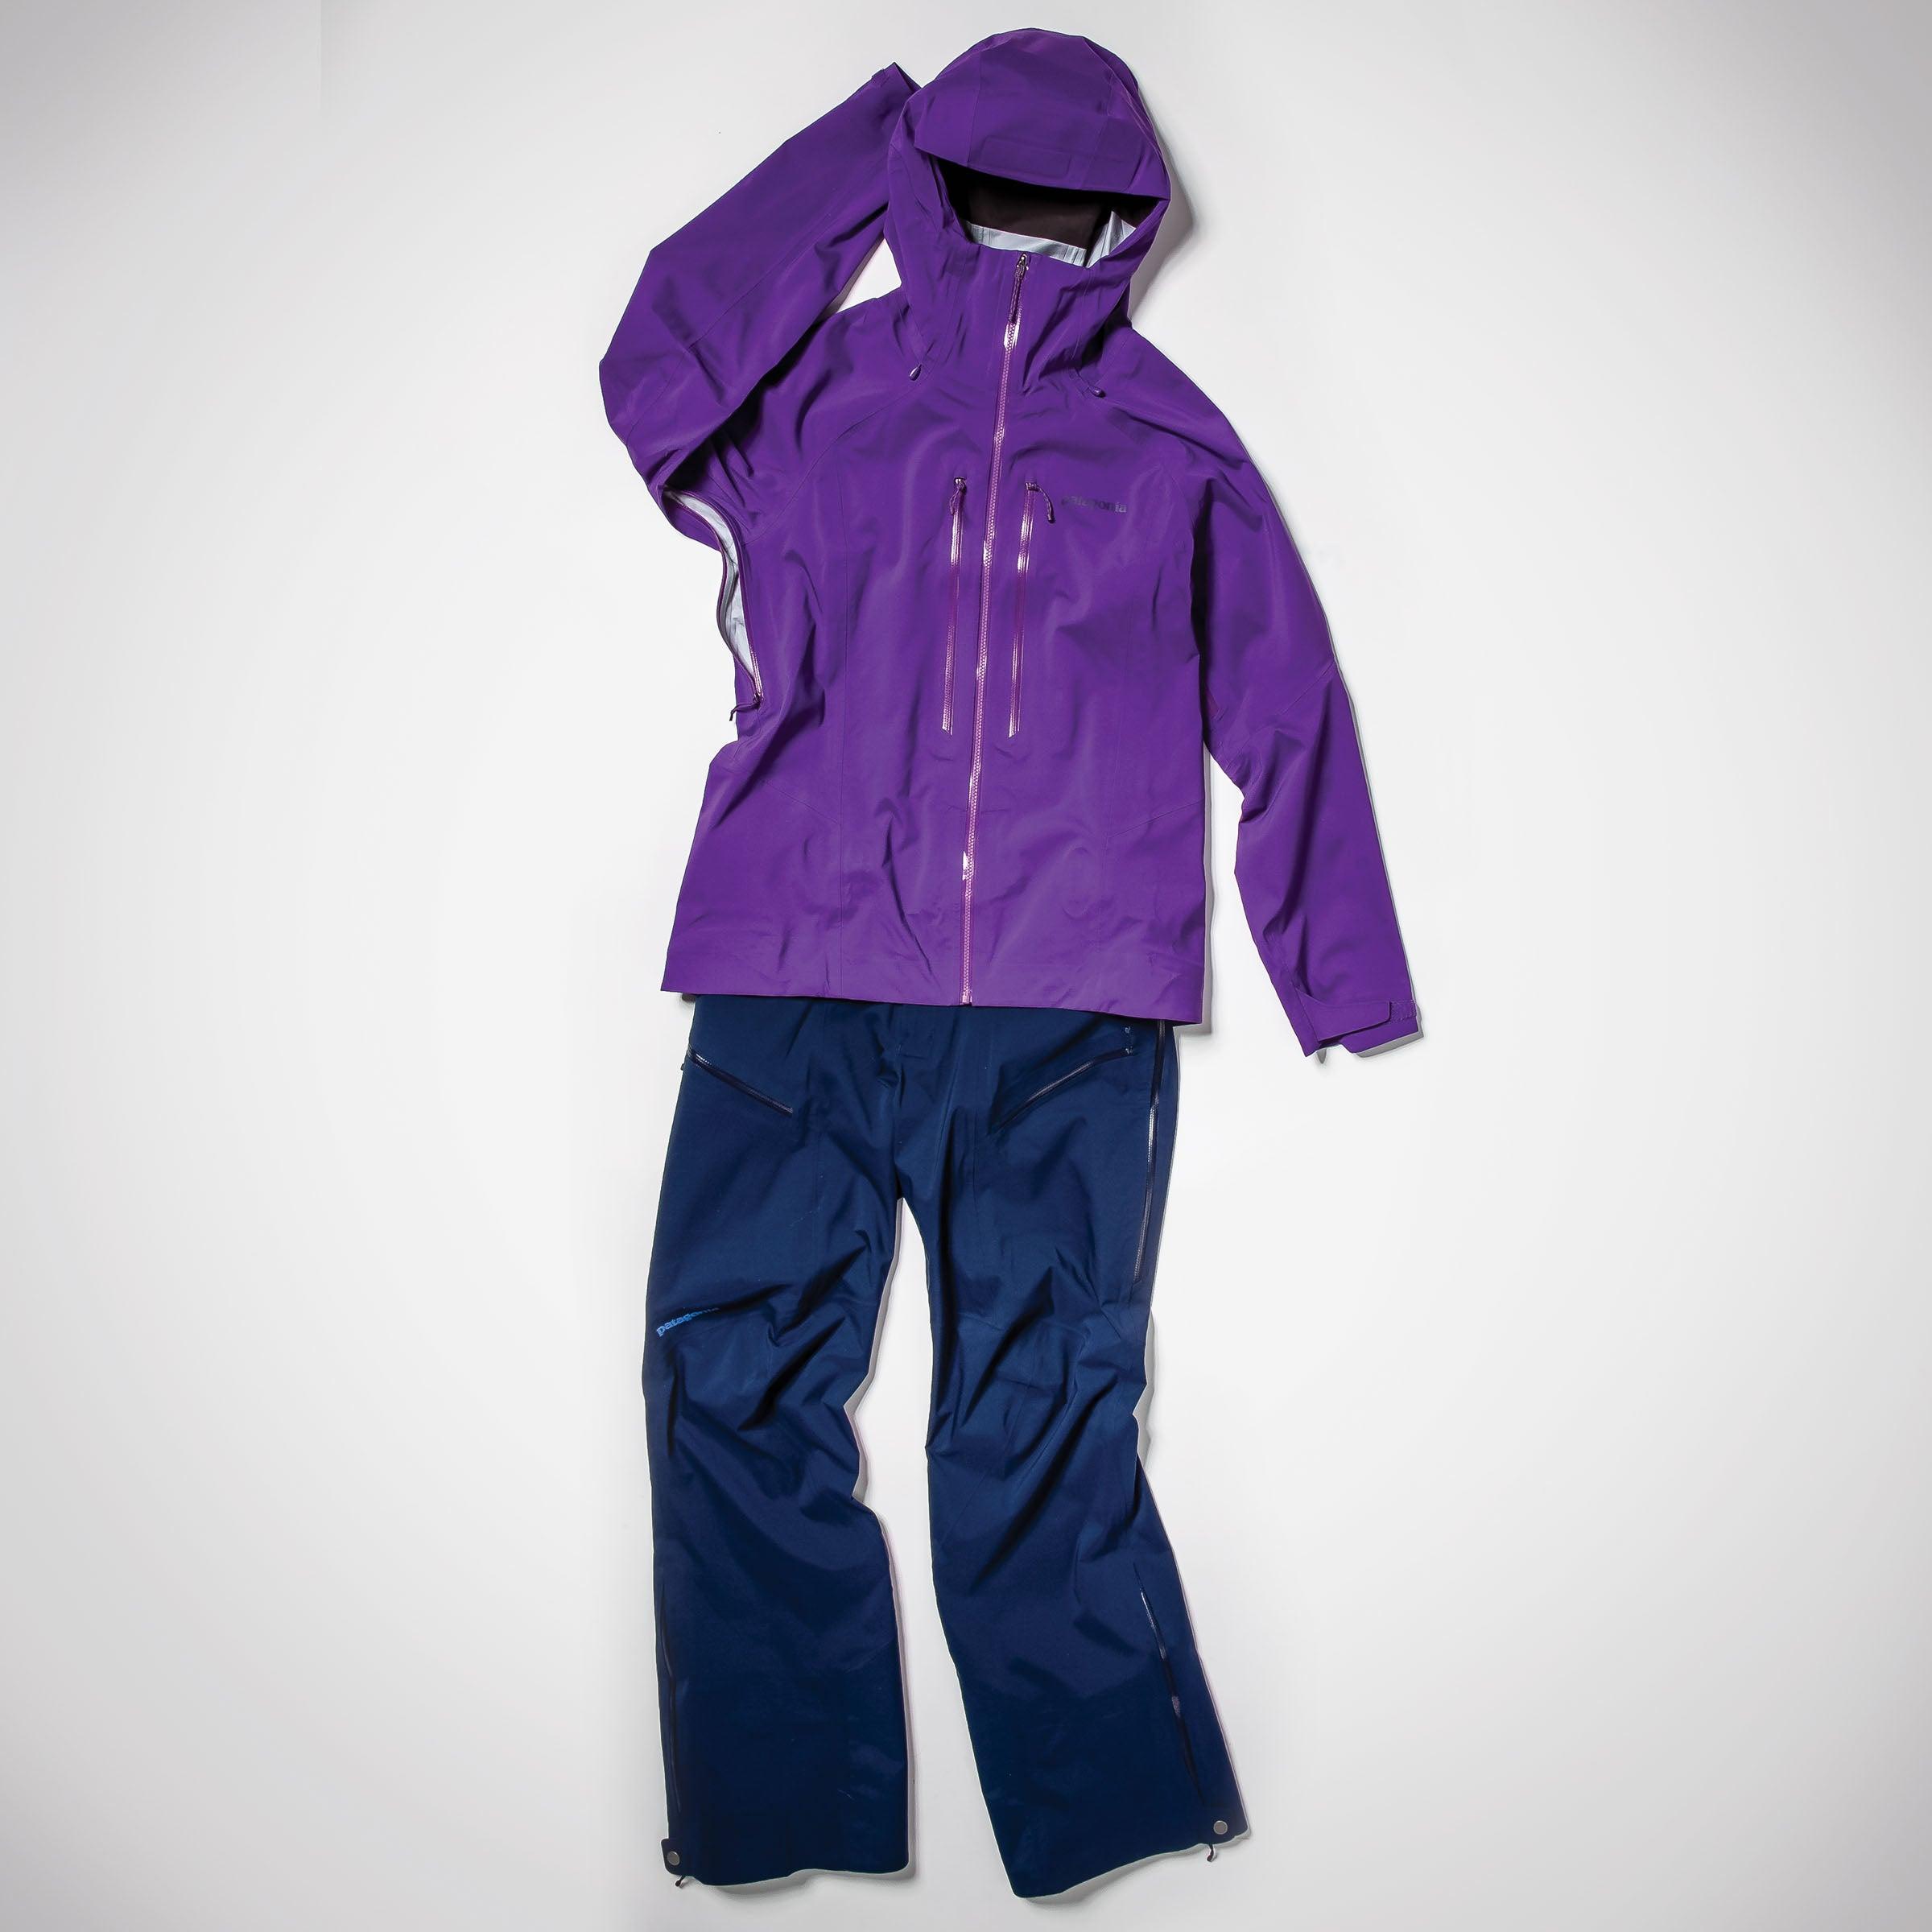 2022 Patagonia Stormstride Jacket and Pants